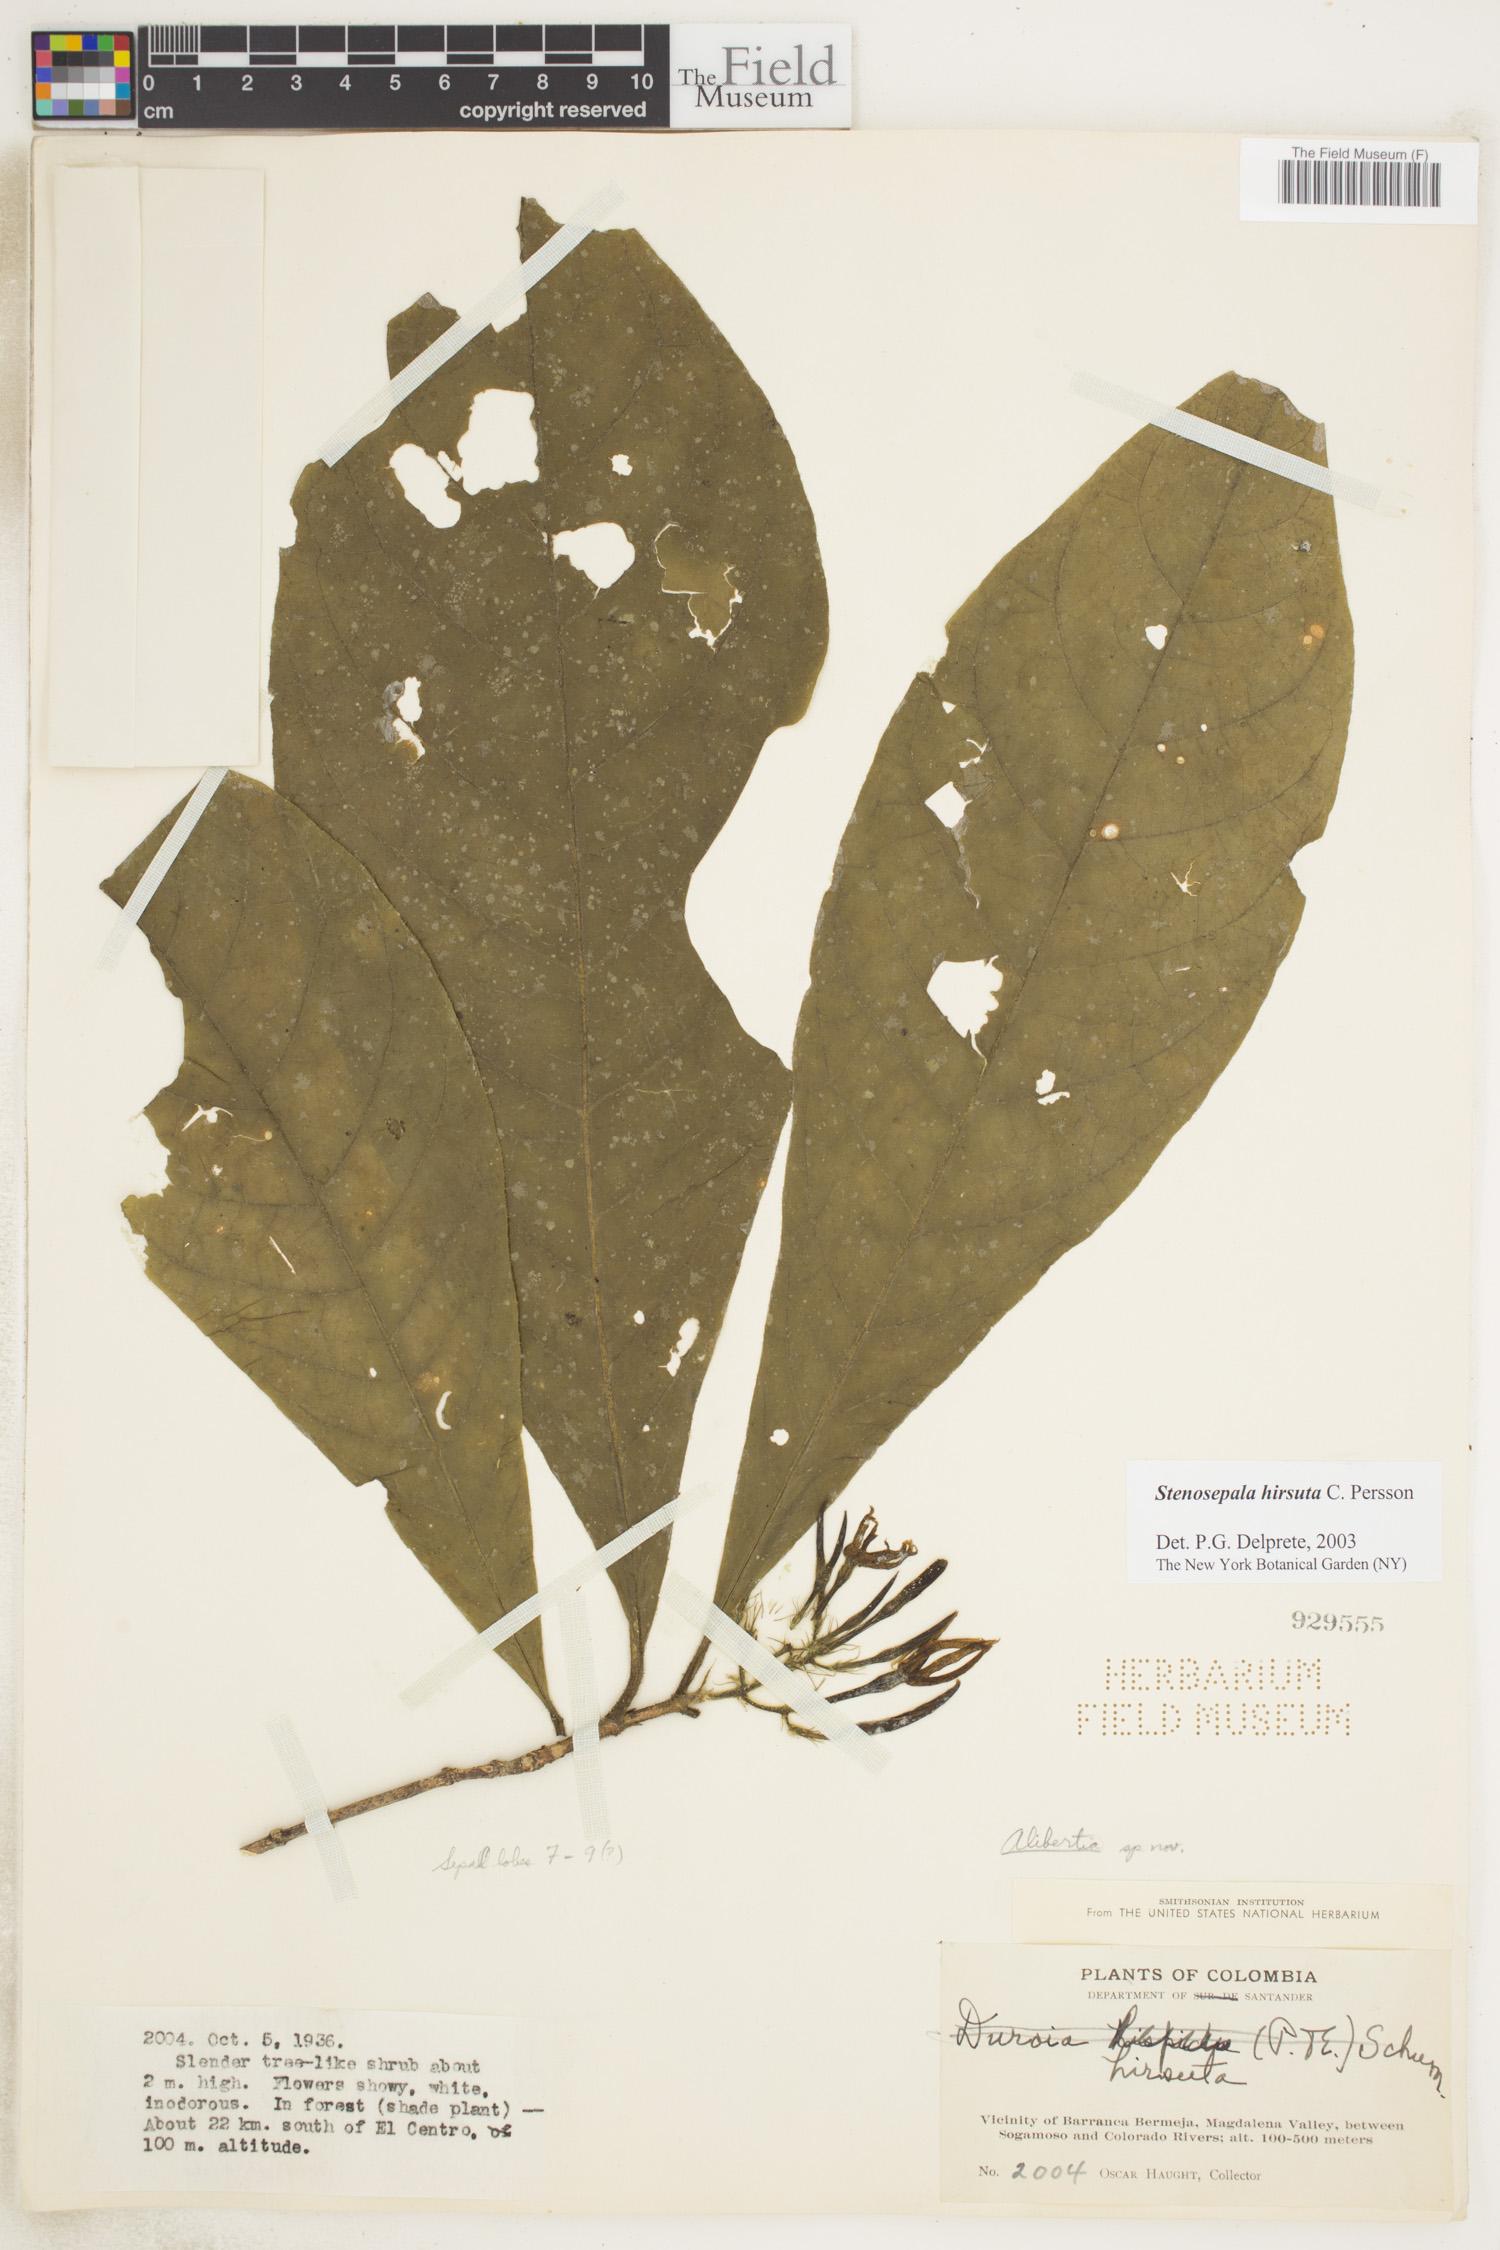 Specimen: Stenosepala hirsuta